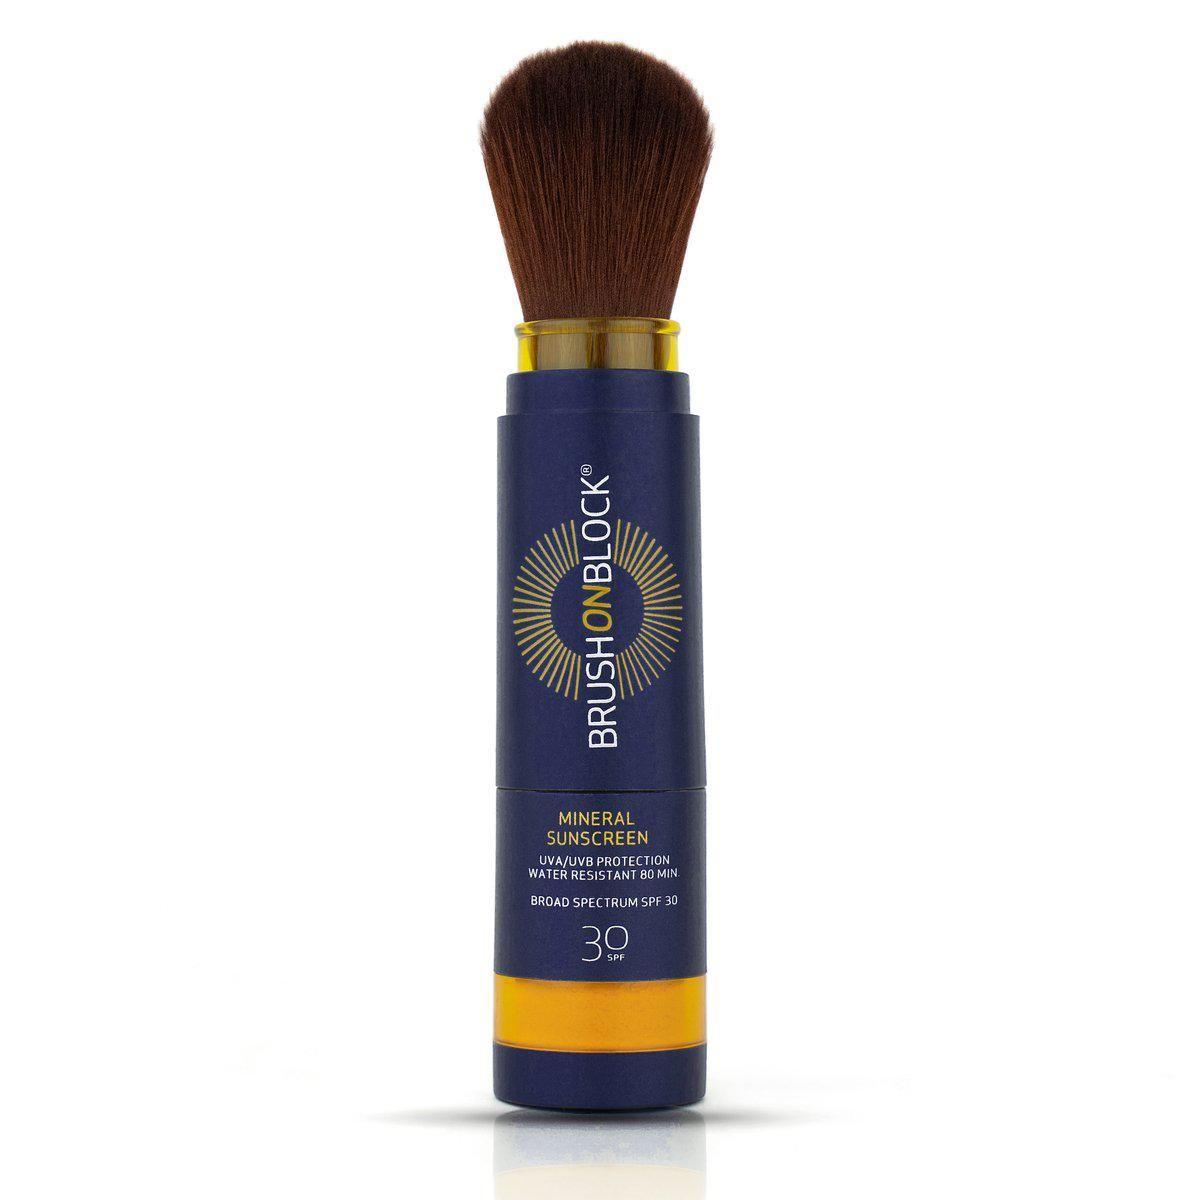 brush on block translucent mineral spf powder sunscreen spf 30